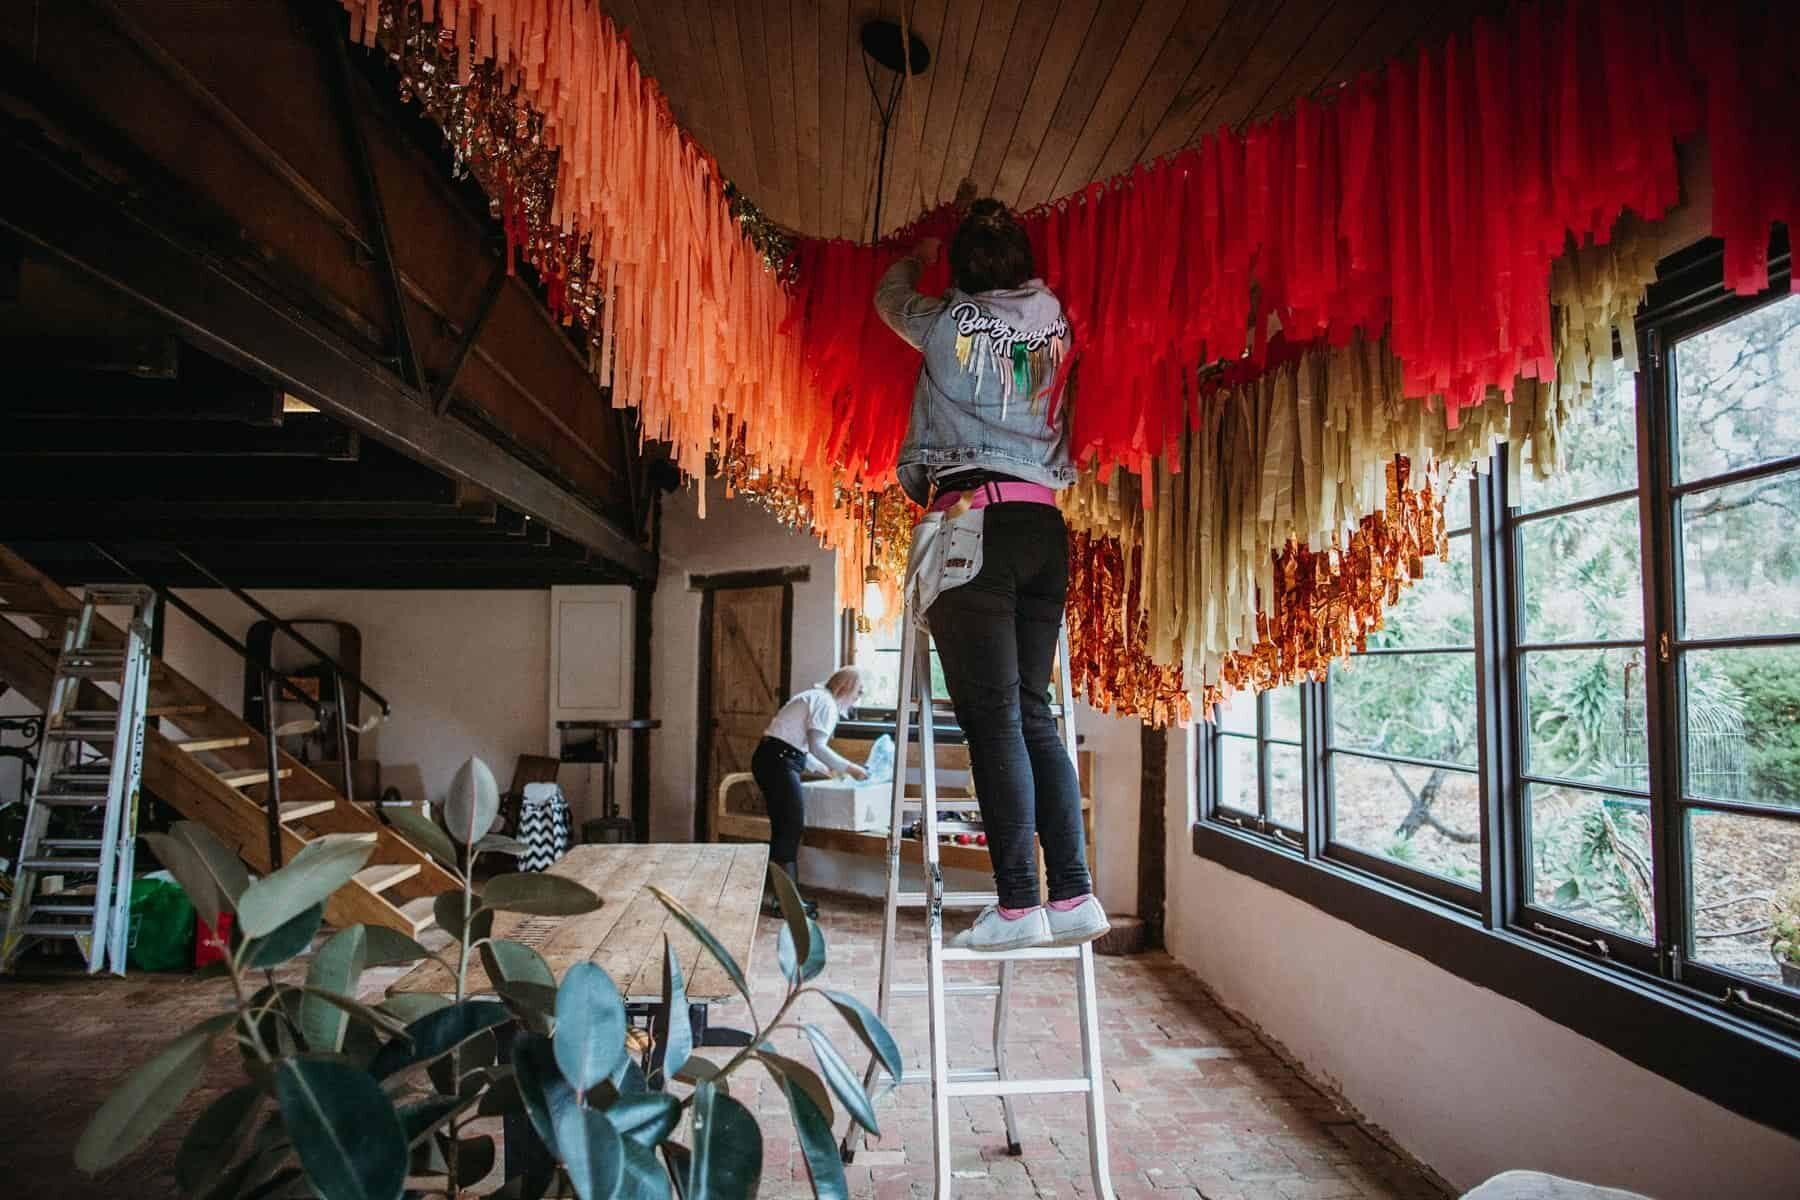 epic pink and gold paper fringe installation by Bangin Hangins